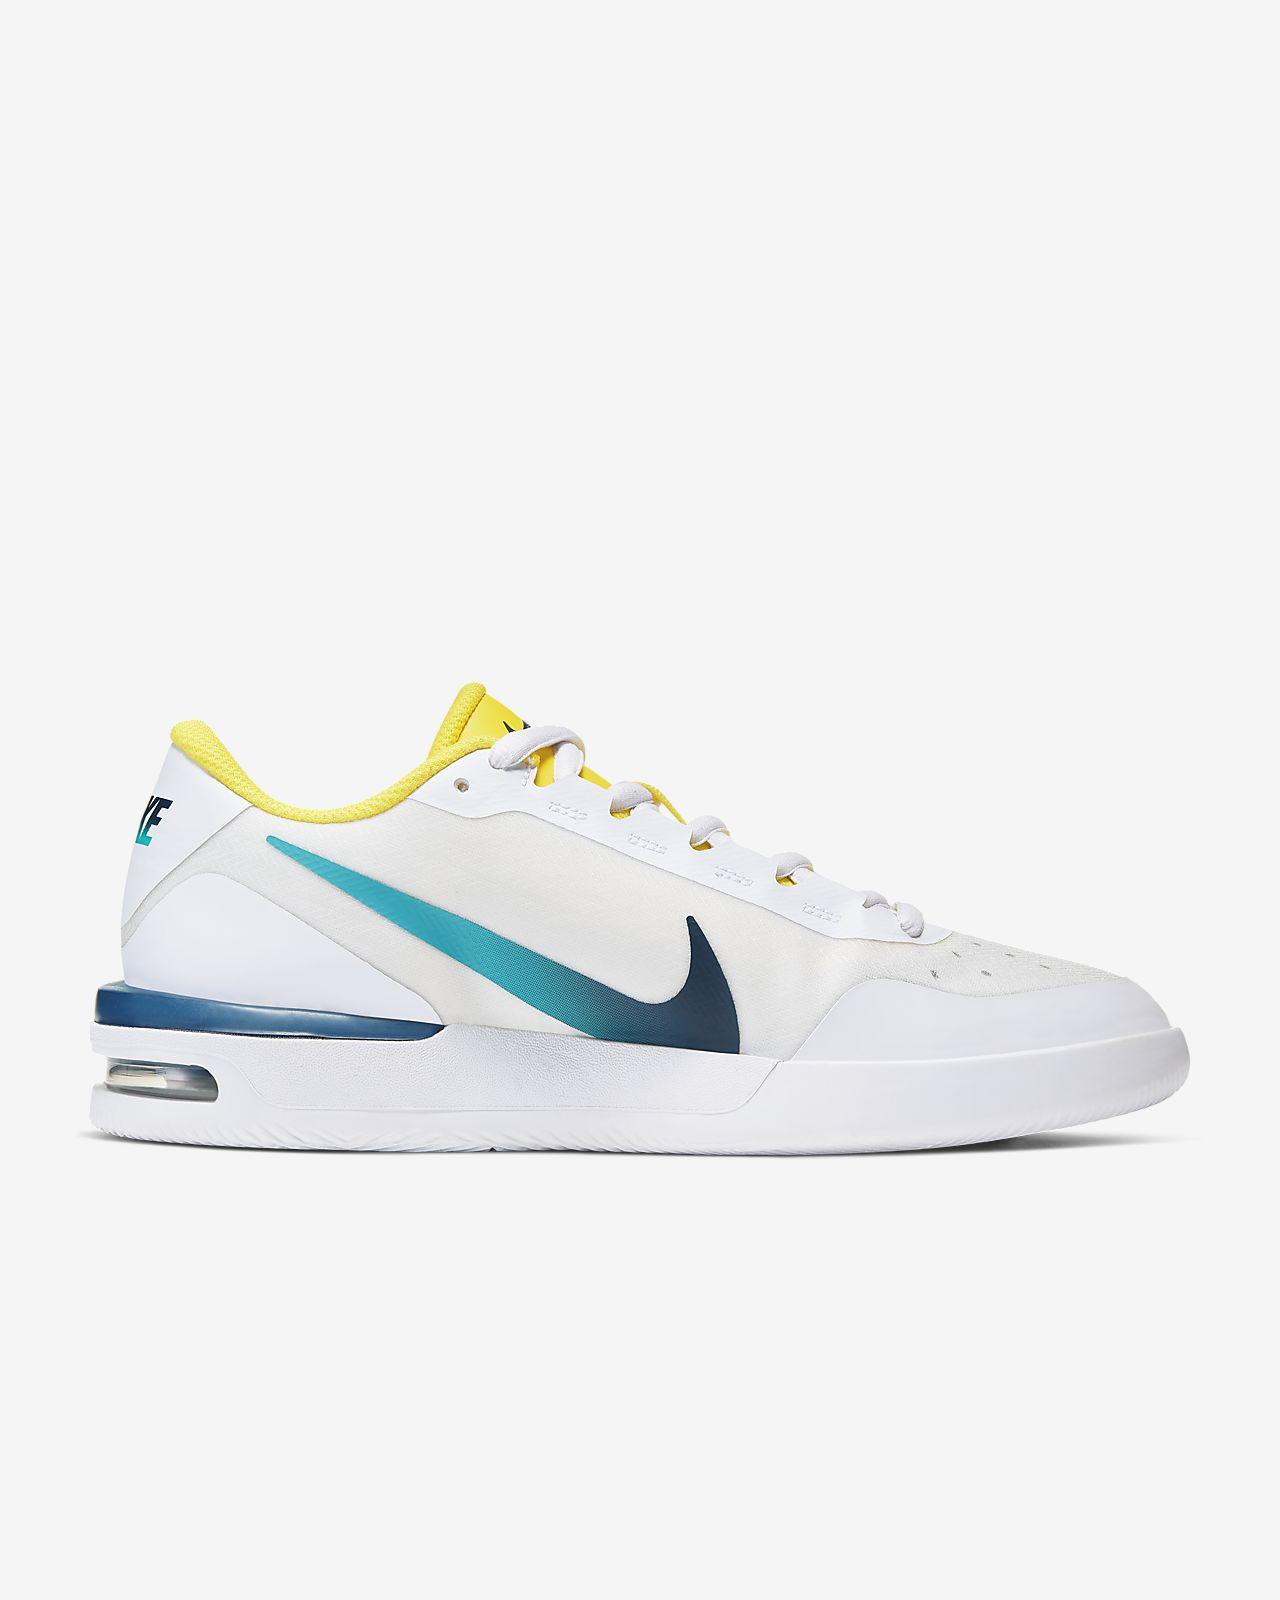 NikeCourt Air Max Vapor Wing MS Women's Tennis Shoe